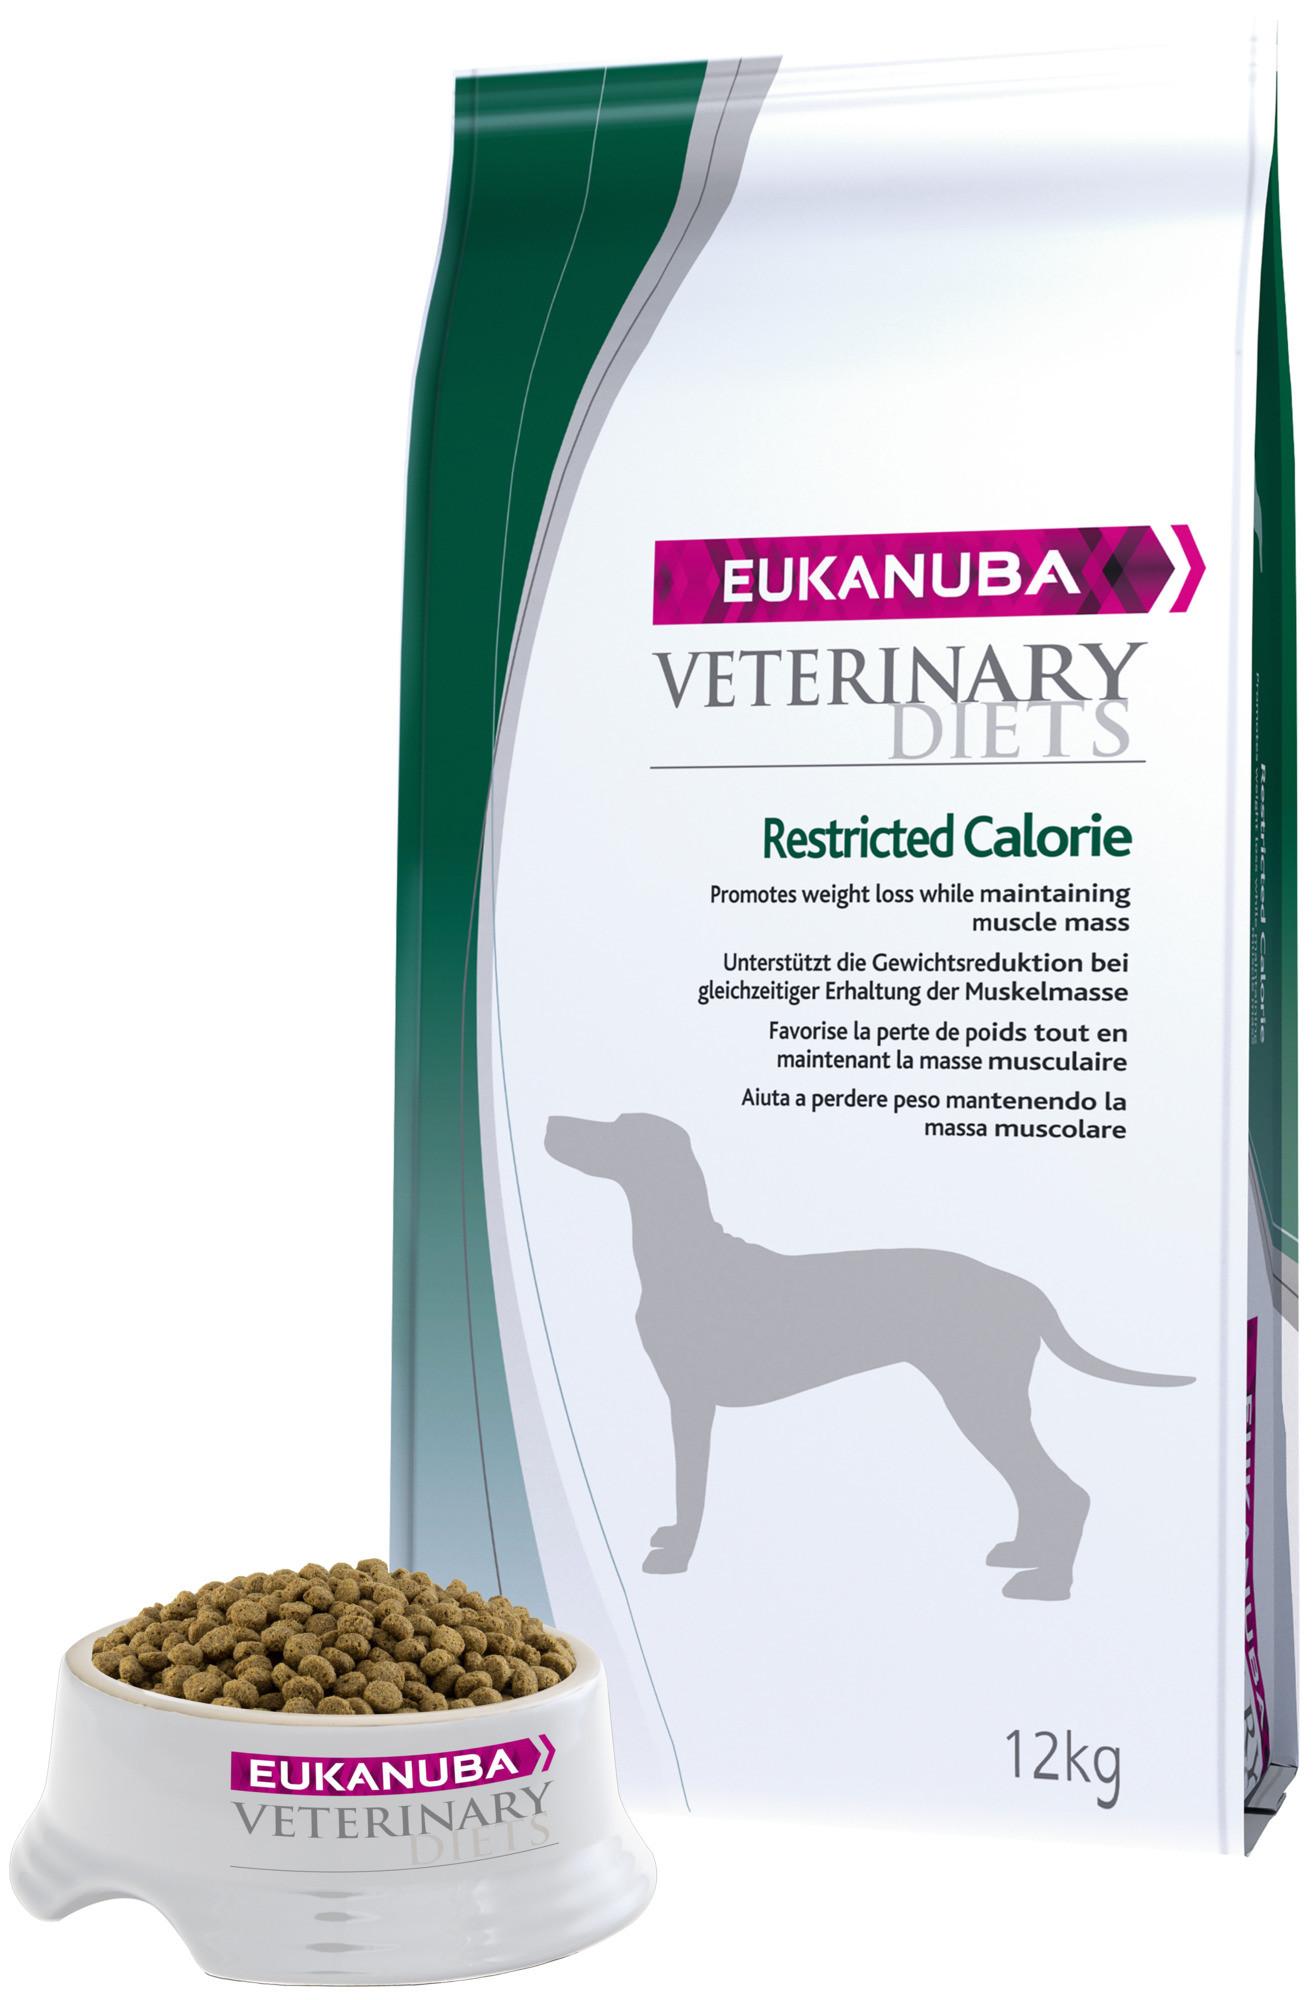 Eukanuba Veterinary Diets Restricted Calories hondenvoer